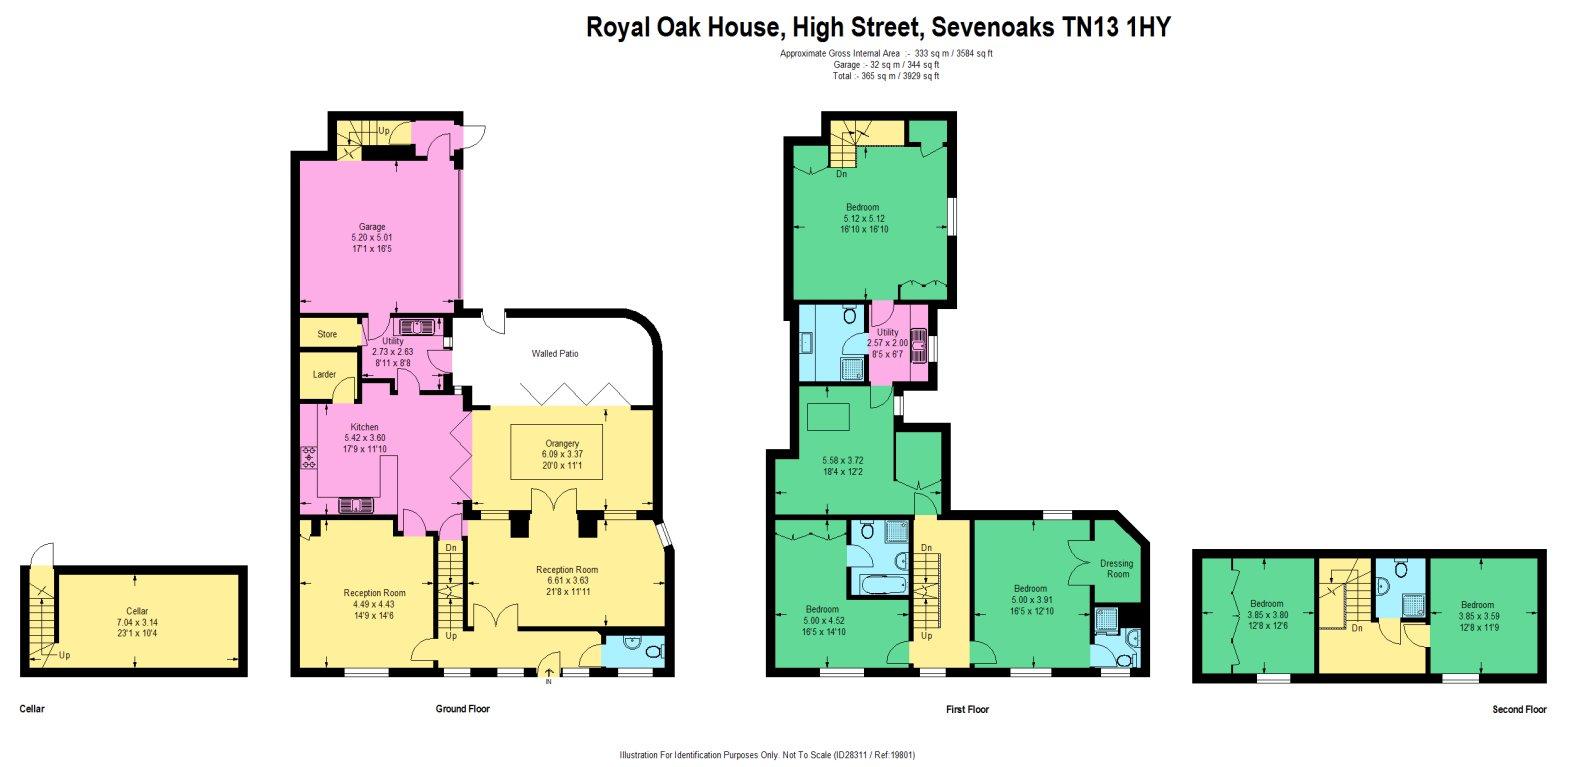 High Street, Sevenoaks TN13 1HY